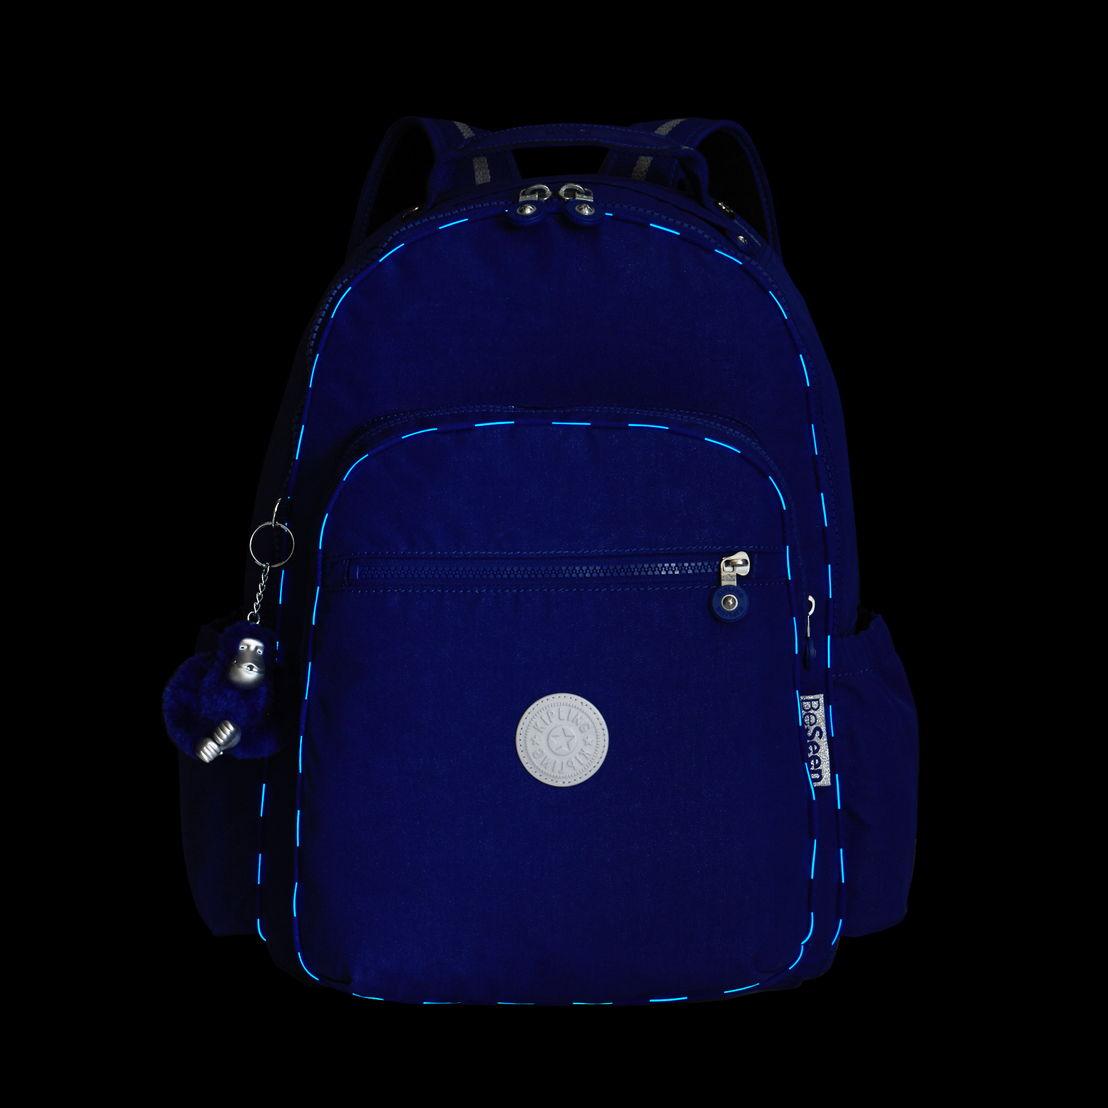 SEOUL GO Cobalt F Light - 129.90€